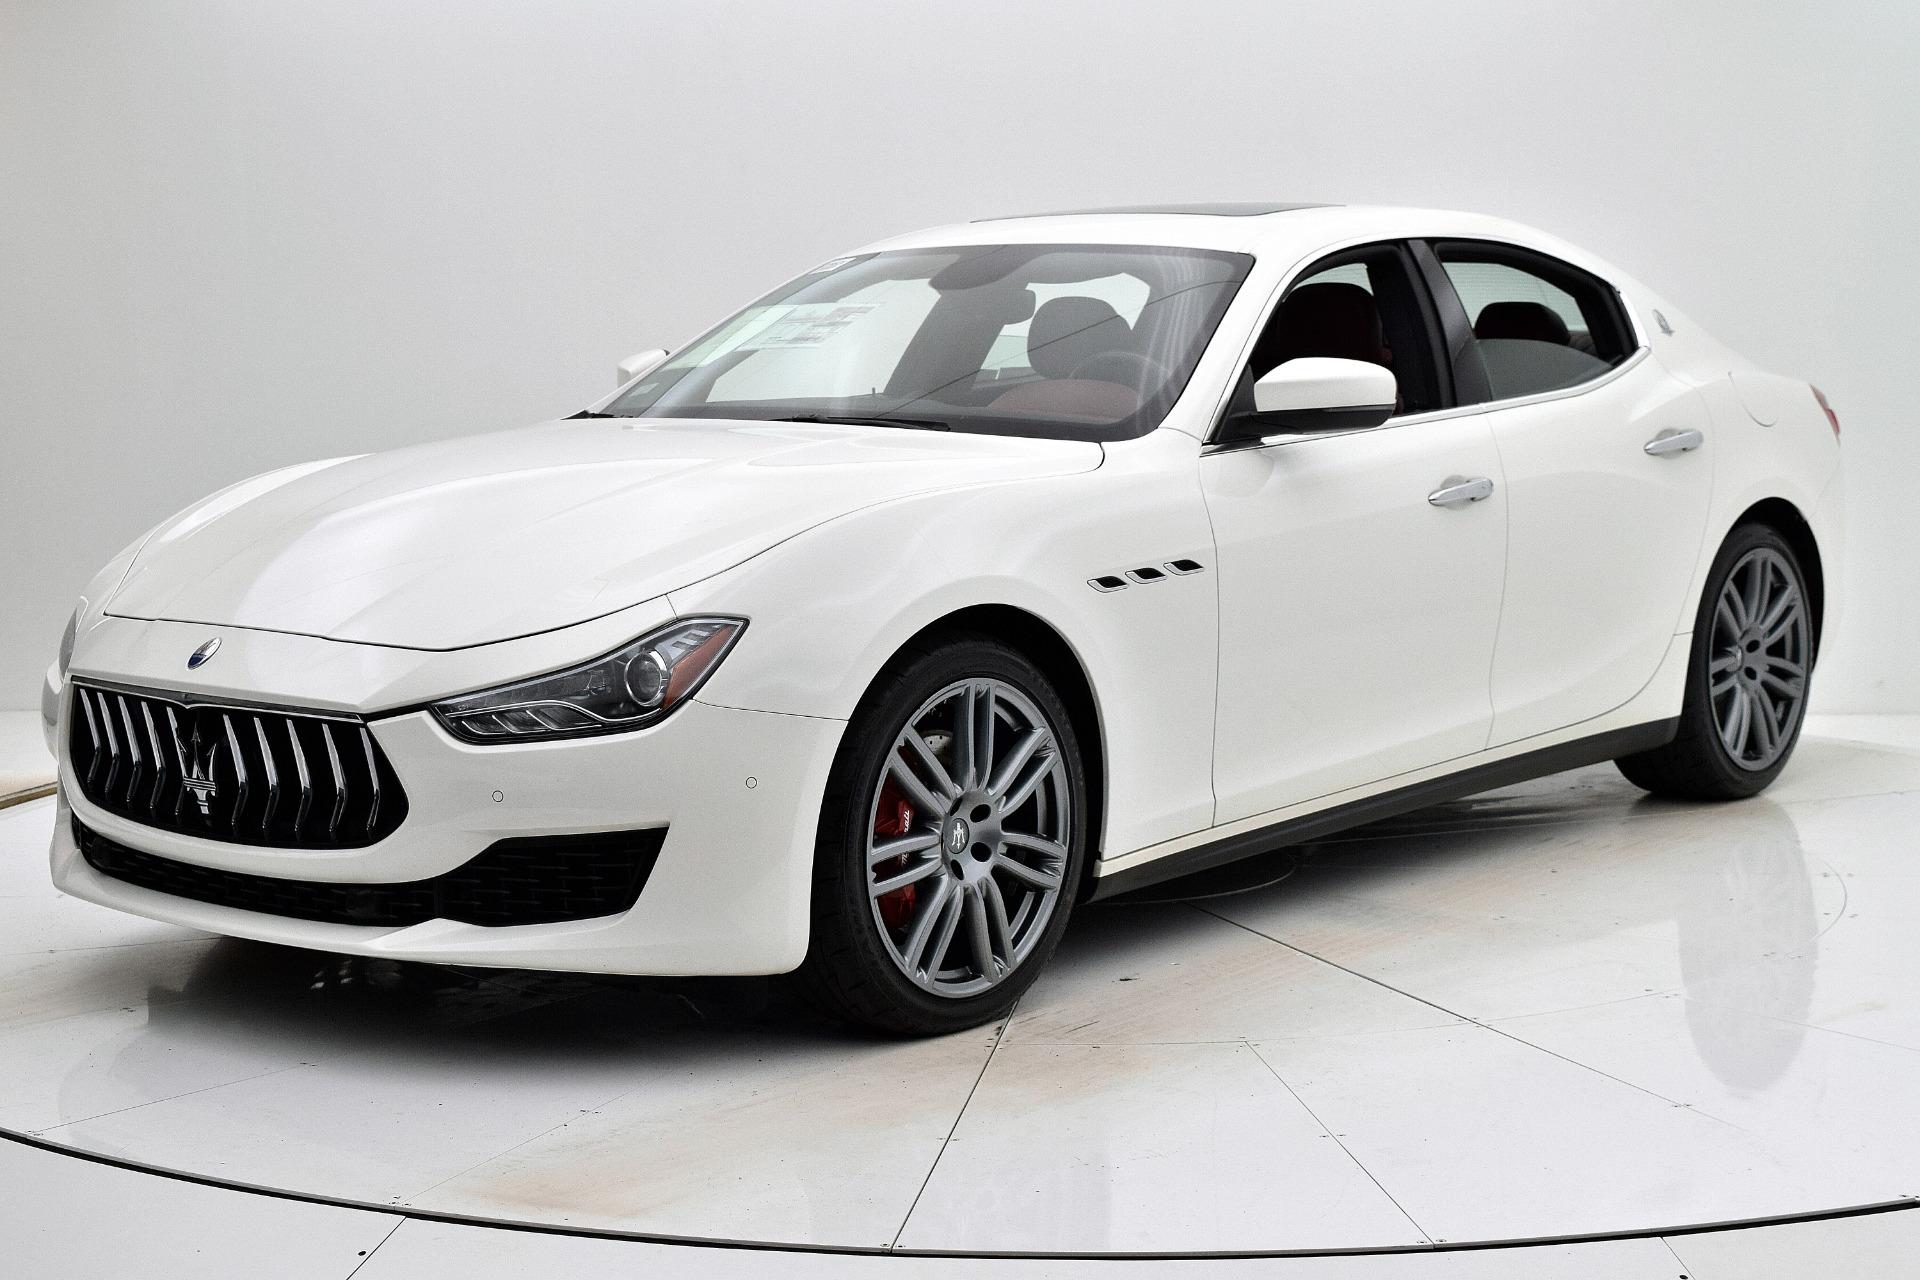 Used 2018 Maserati Ghibli SQ4 for sale $53,880 at Bentley Palmyra N.J. in Palmyra NJ 08065 2